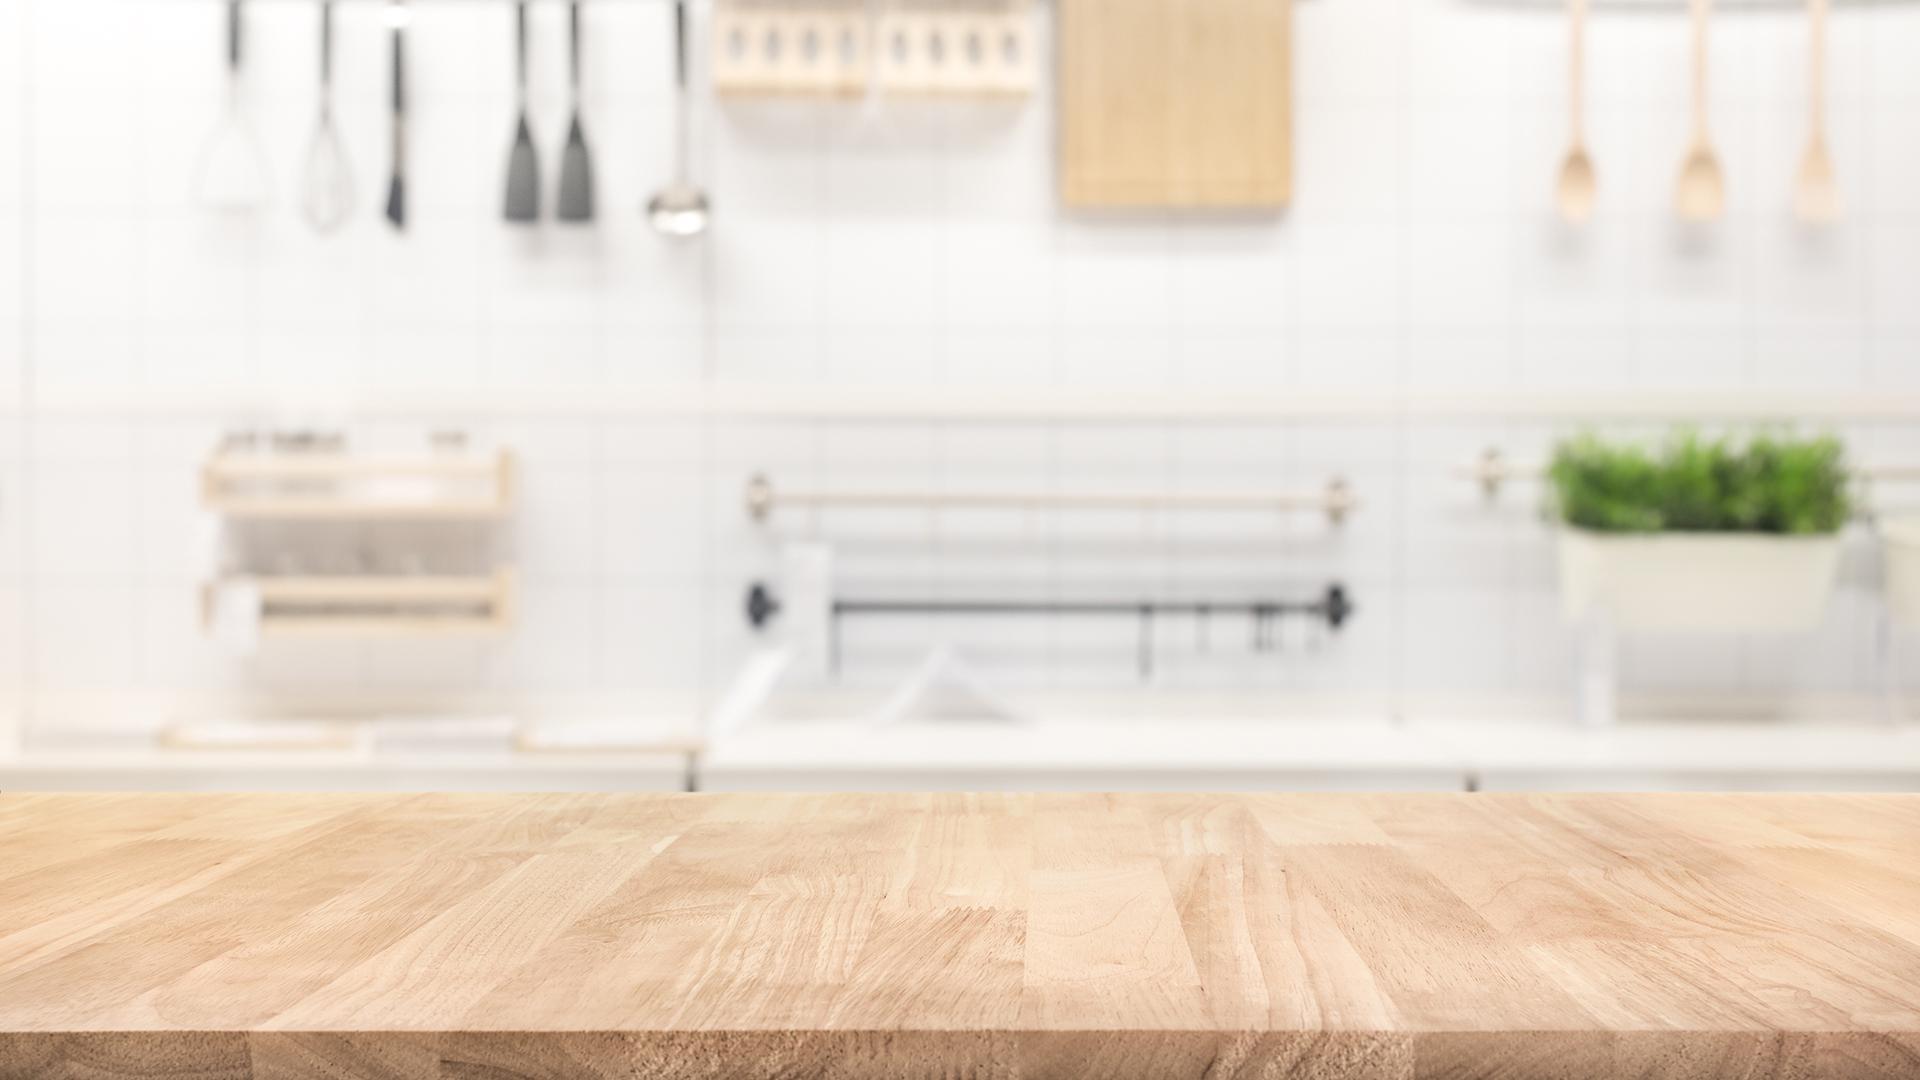 Giani Butcher Block Countertop Paint Kit Review | Rachael ...